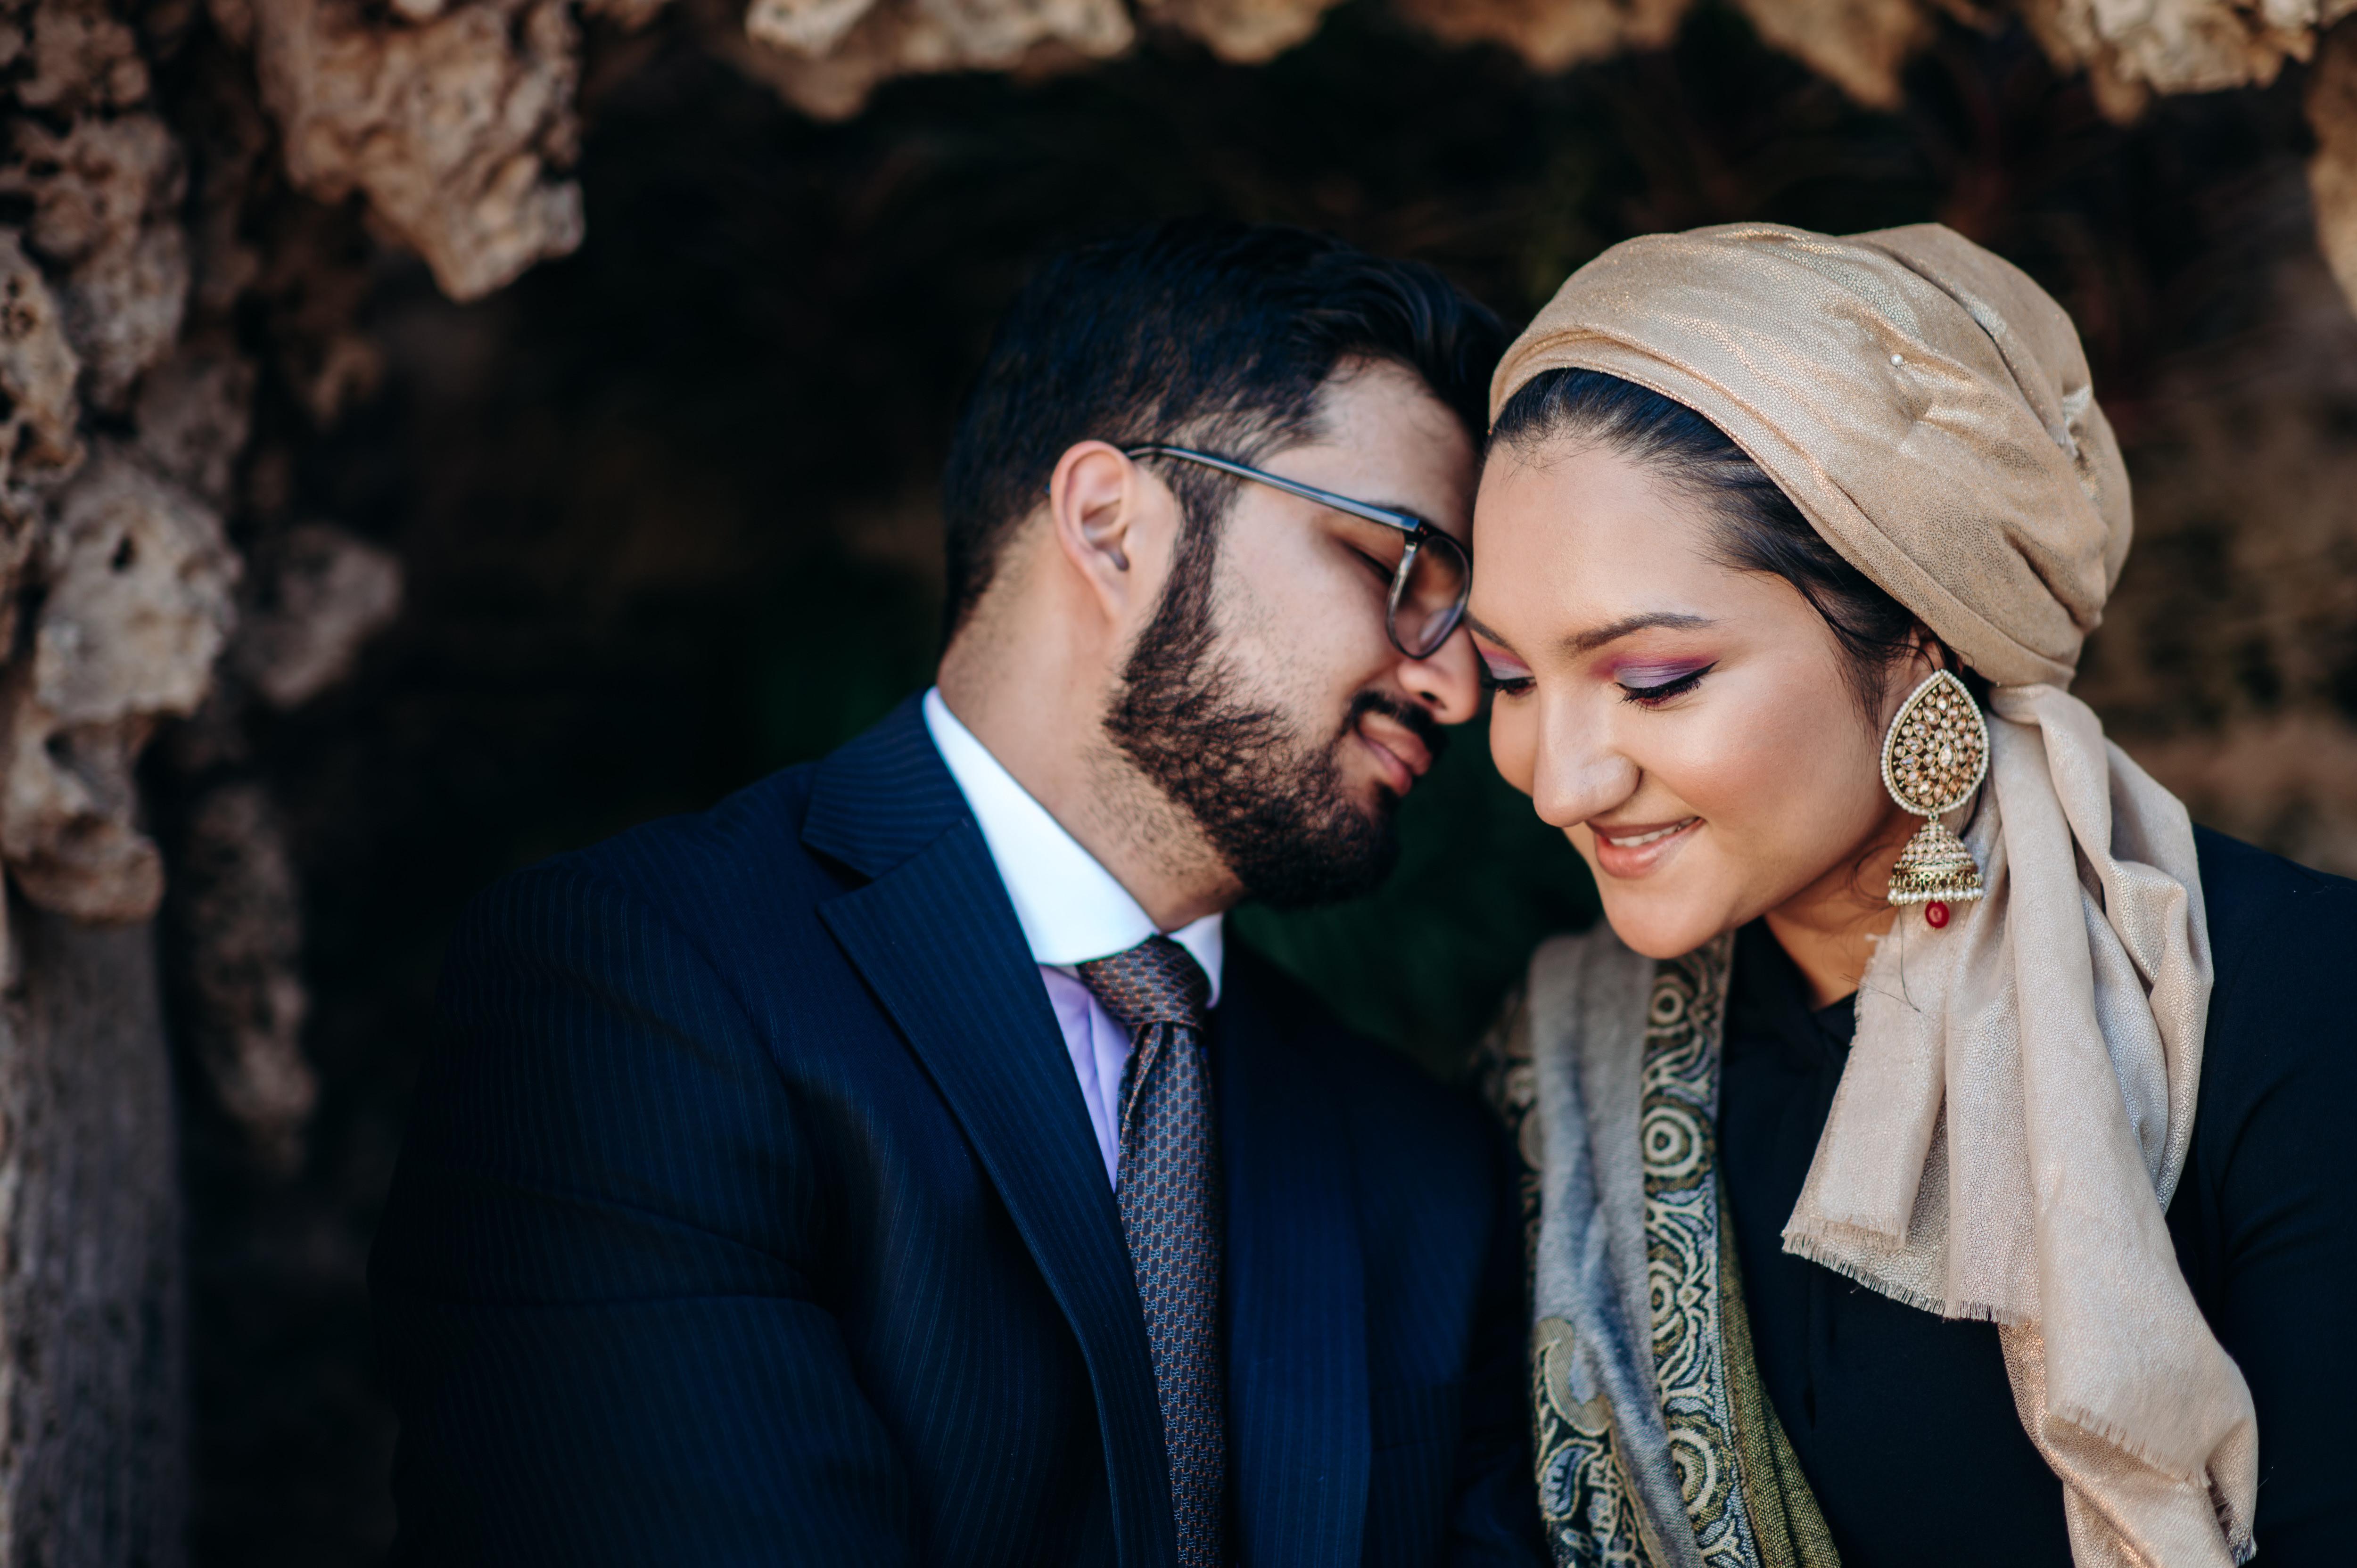 Emana + Zubin Engagement